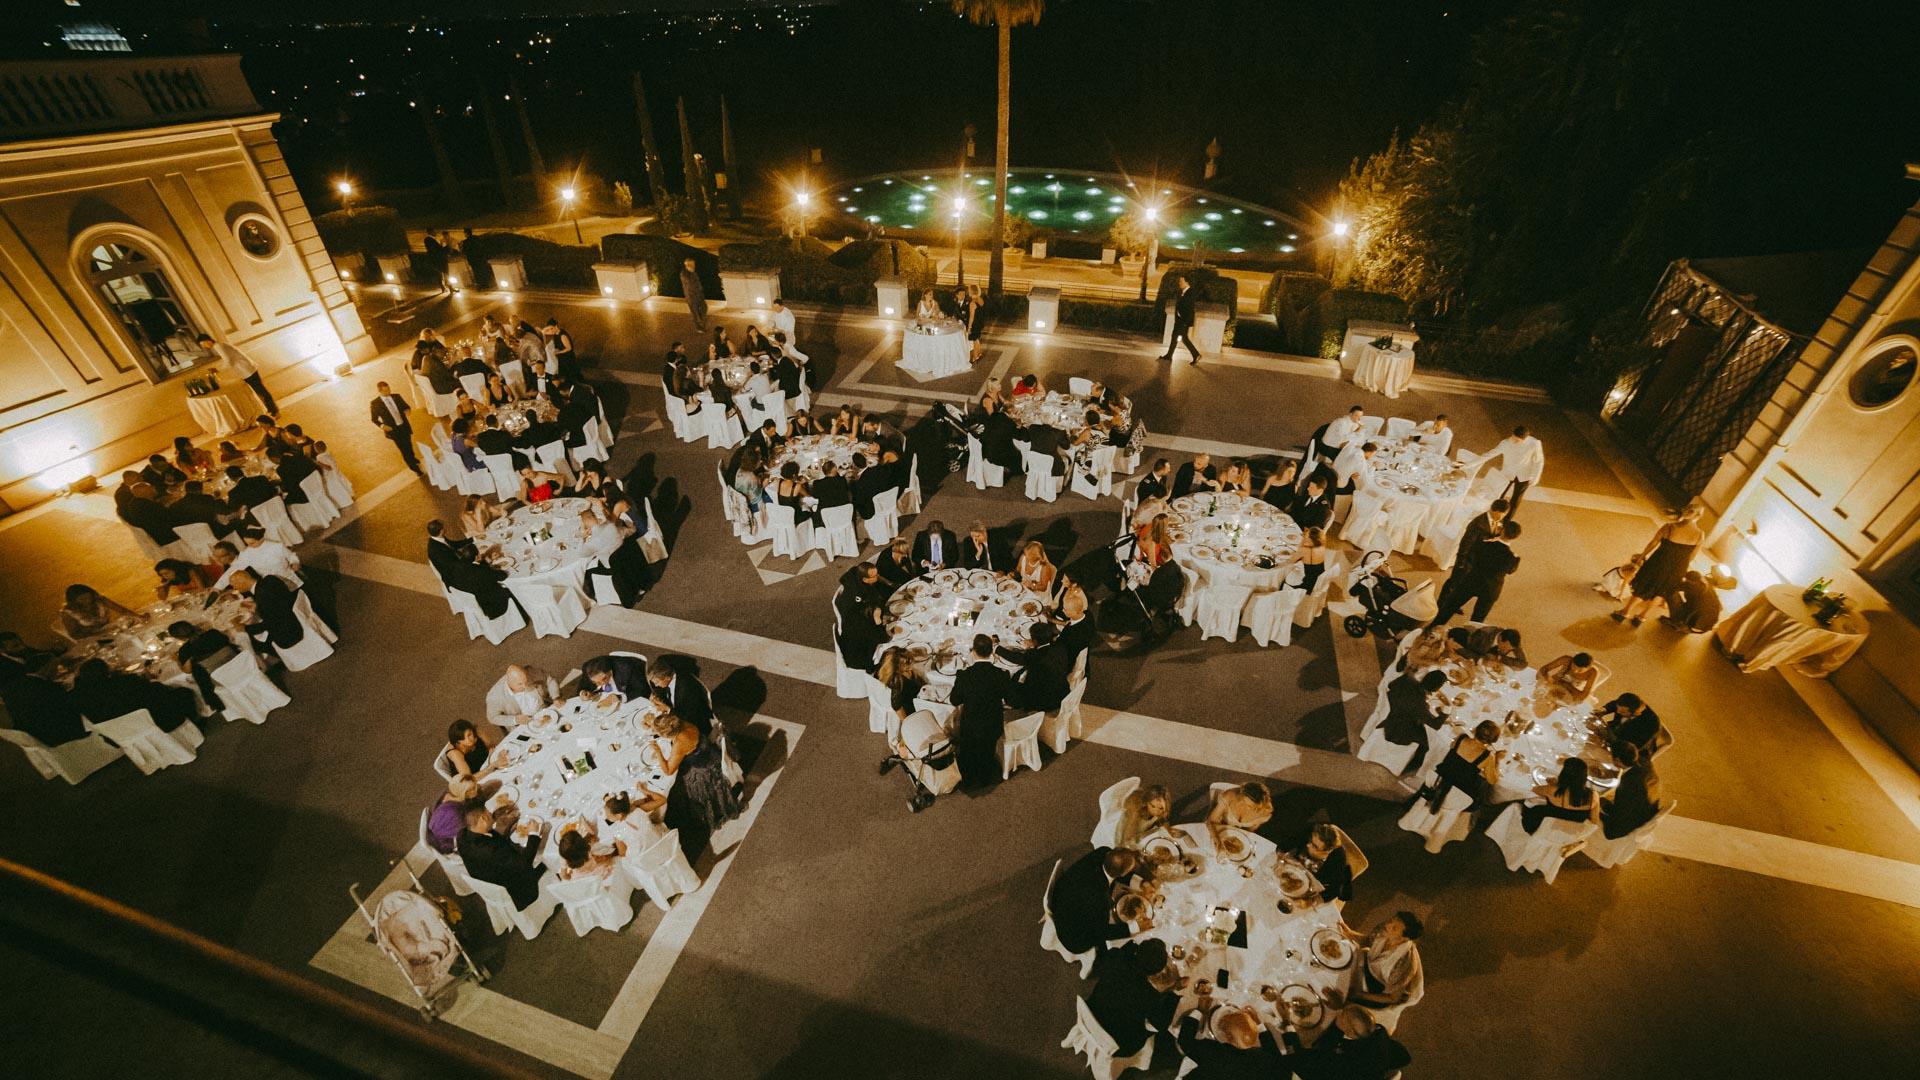 Matrimonio Villa Miani - Santa Maria in Transpontina